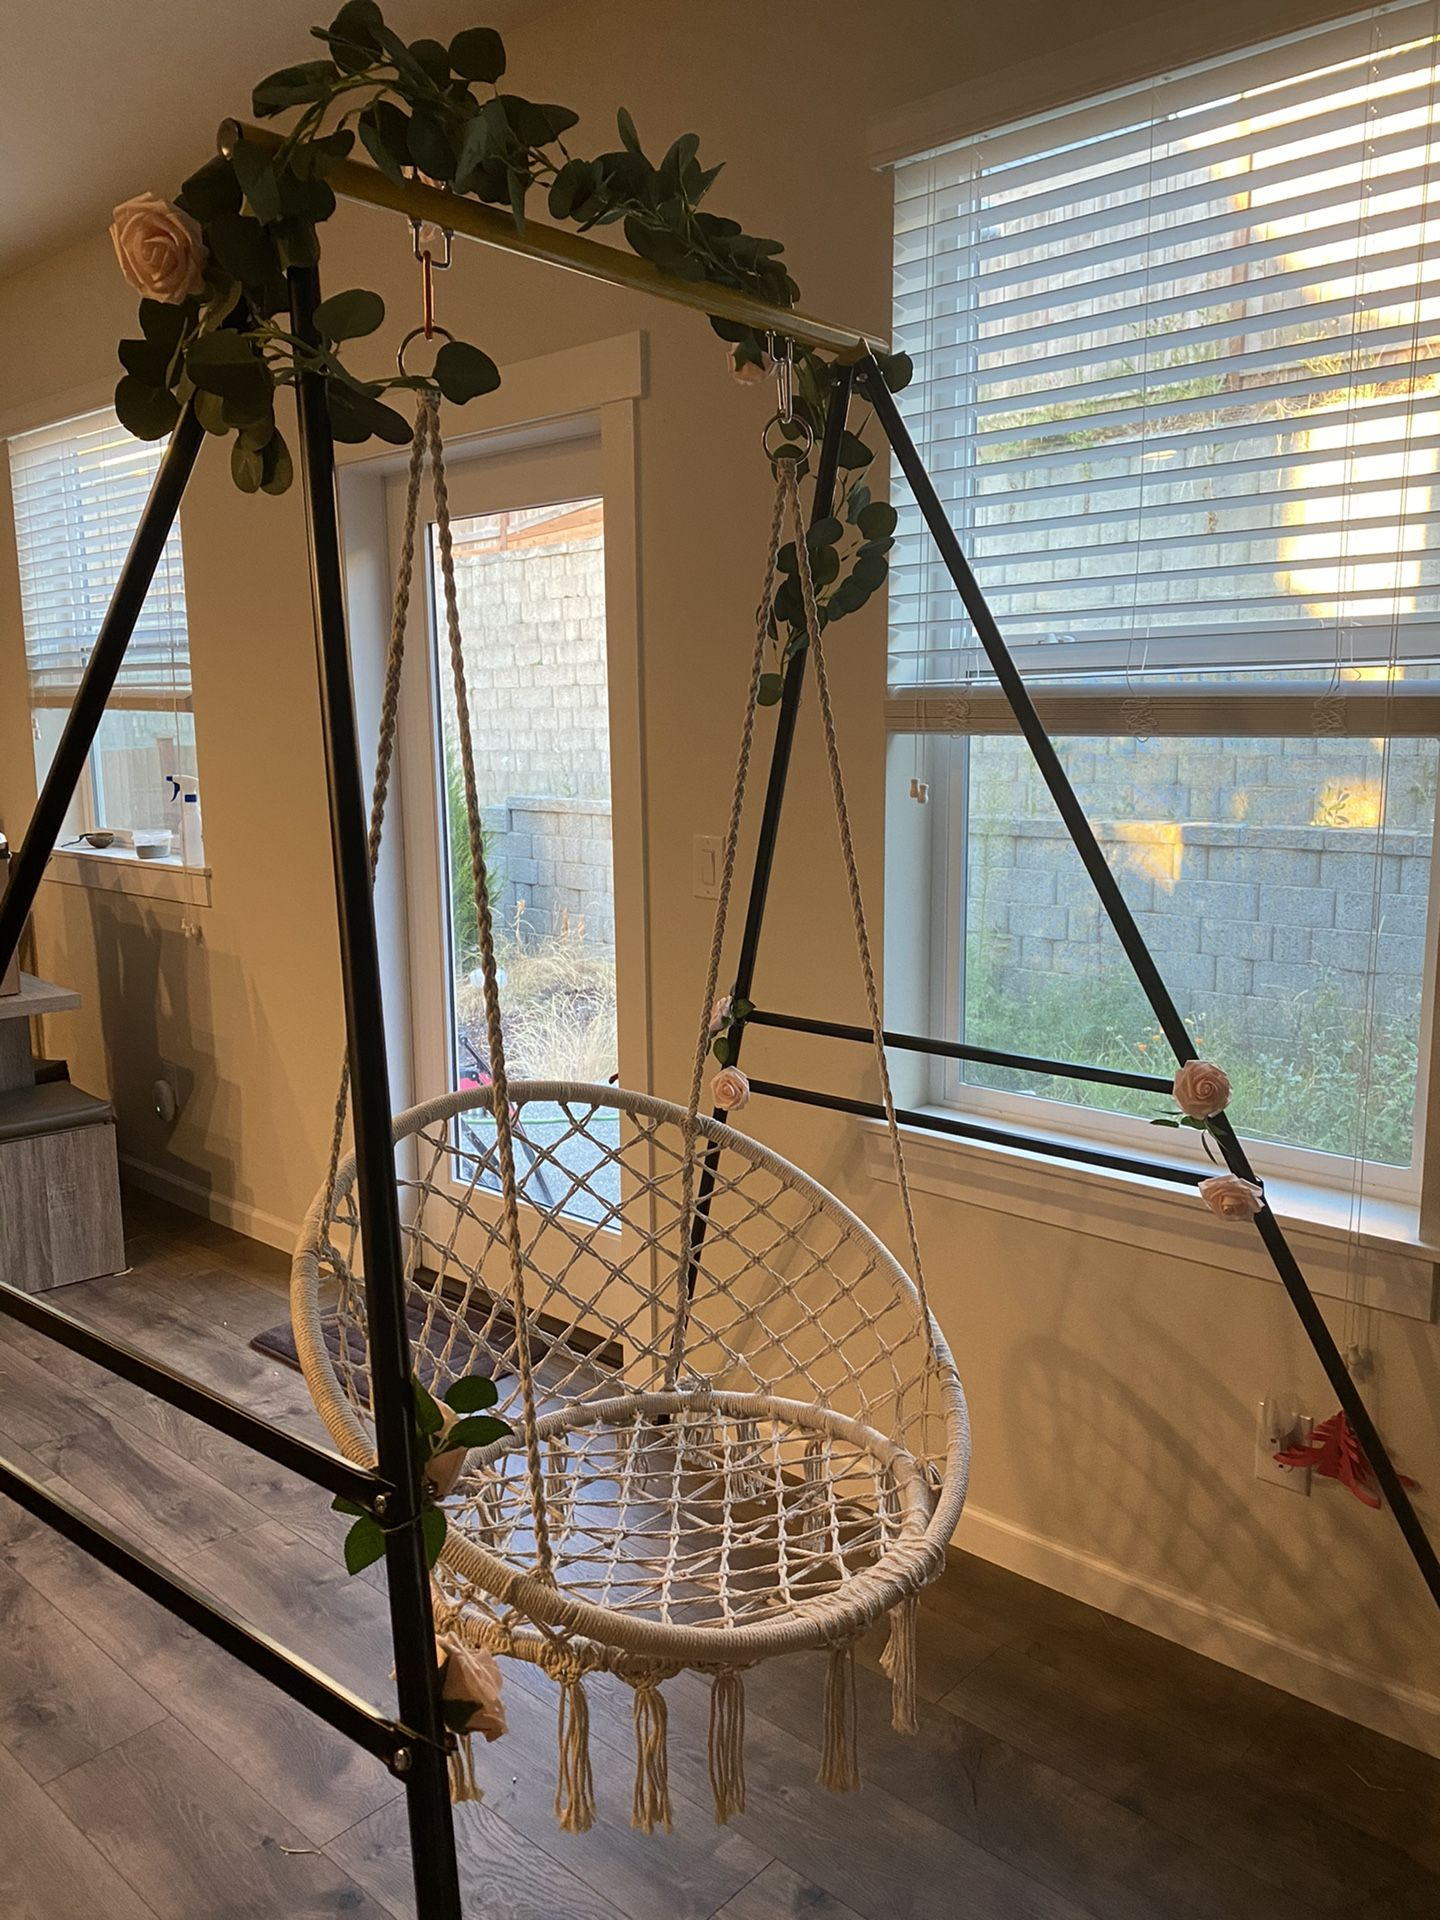 Hanging chair, hammock chair